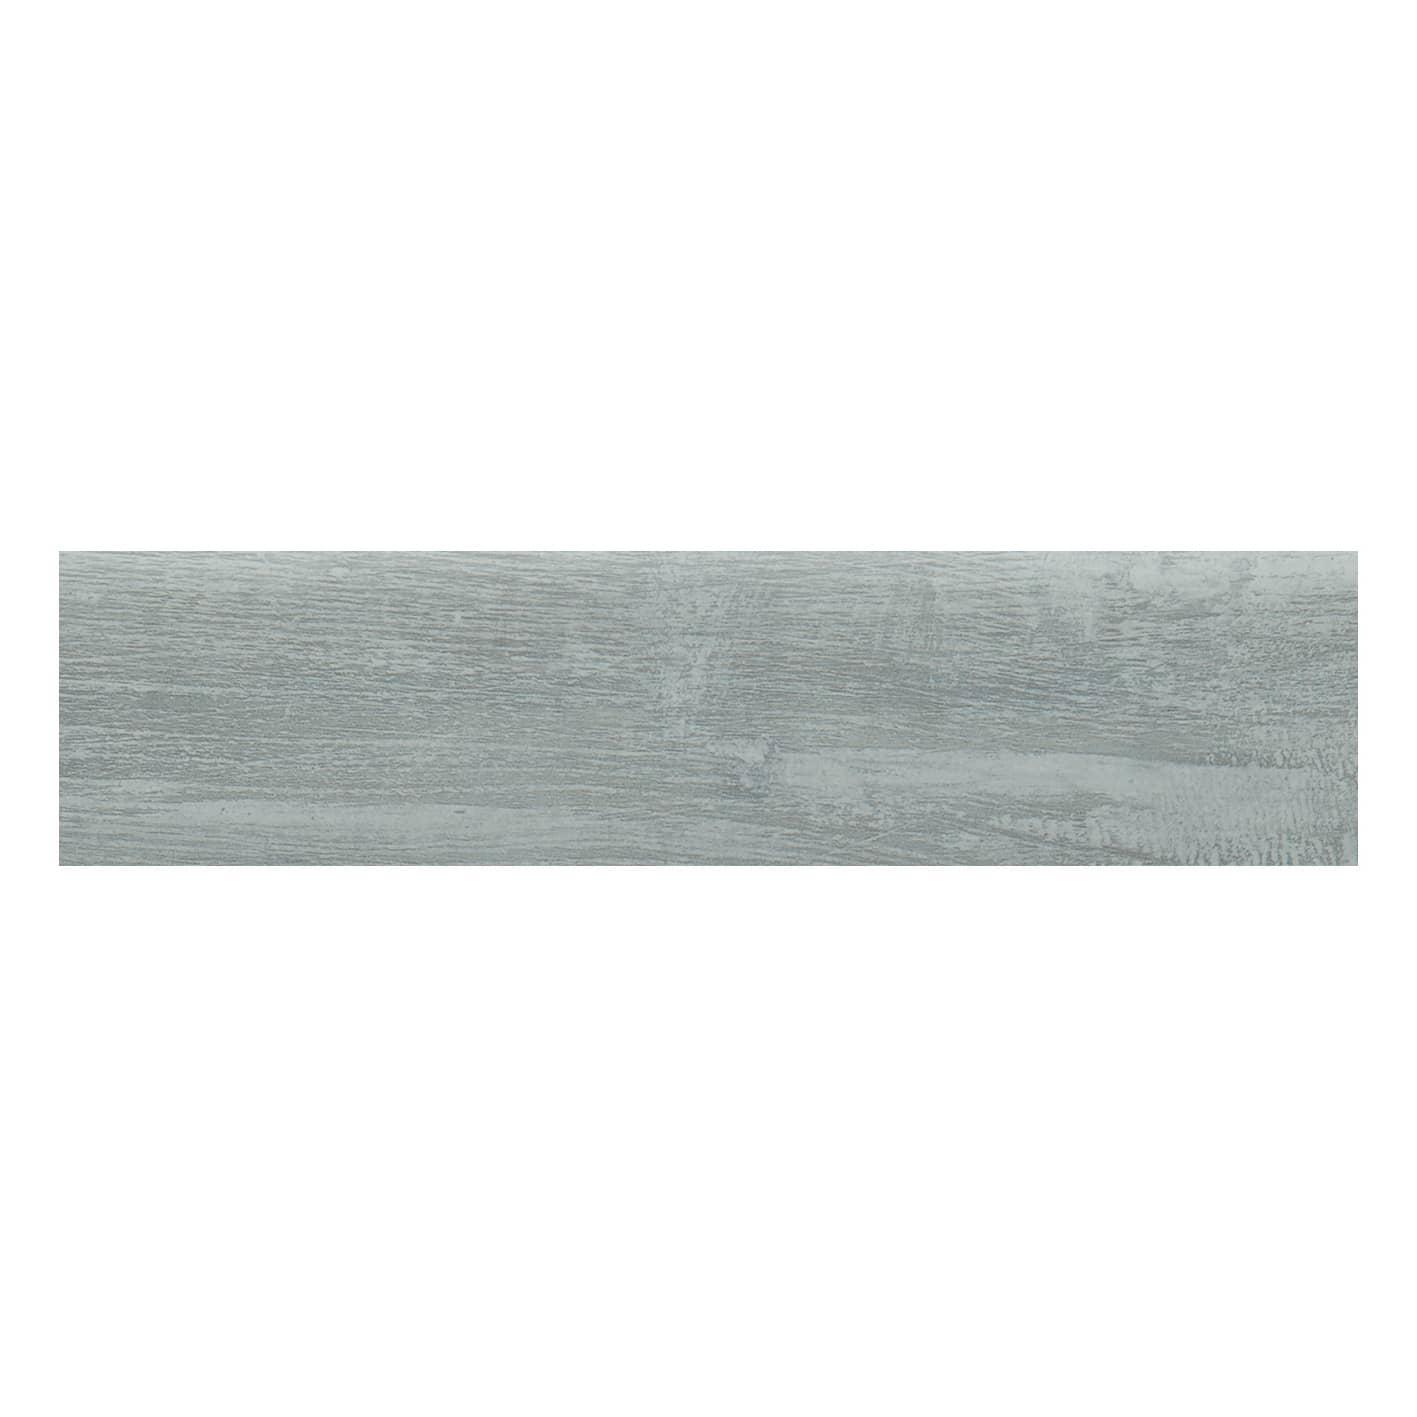 Battiscopa Tundra Grigio 8 X 33 3 Cm Prezzi E Offerte Online Leroy